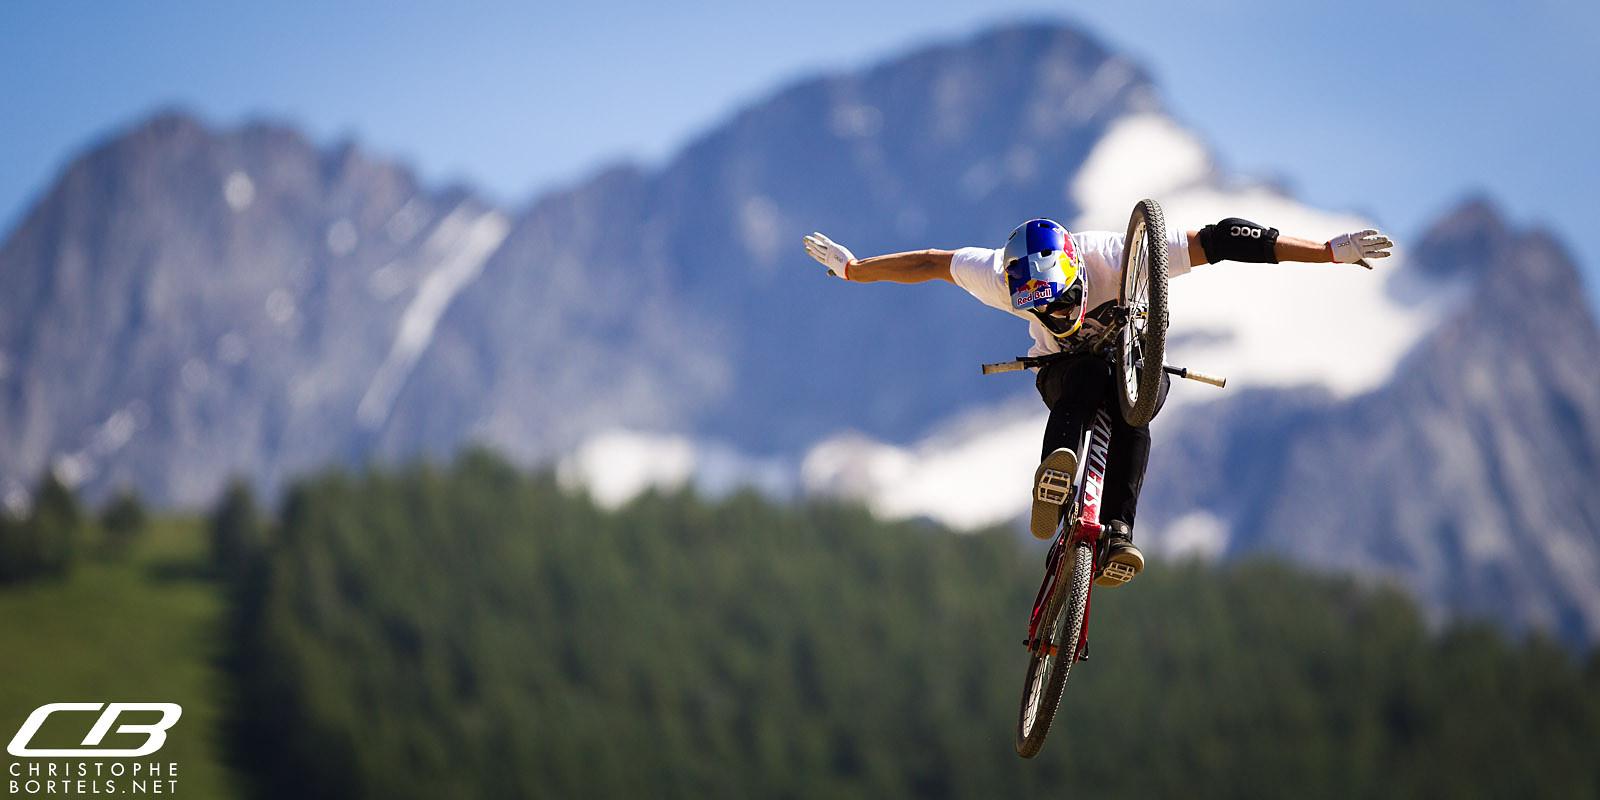 Martin Söderström  - chrisbortels - Mountain Biking Pictures - Vital MTB